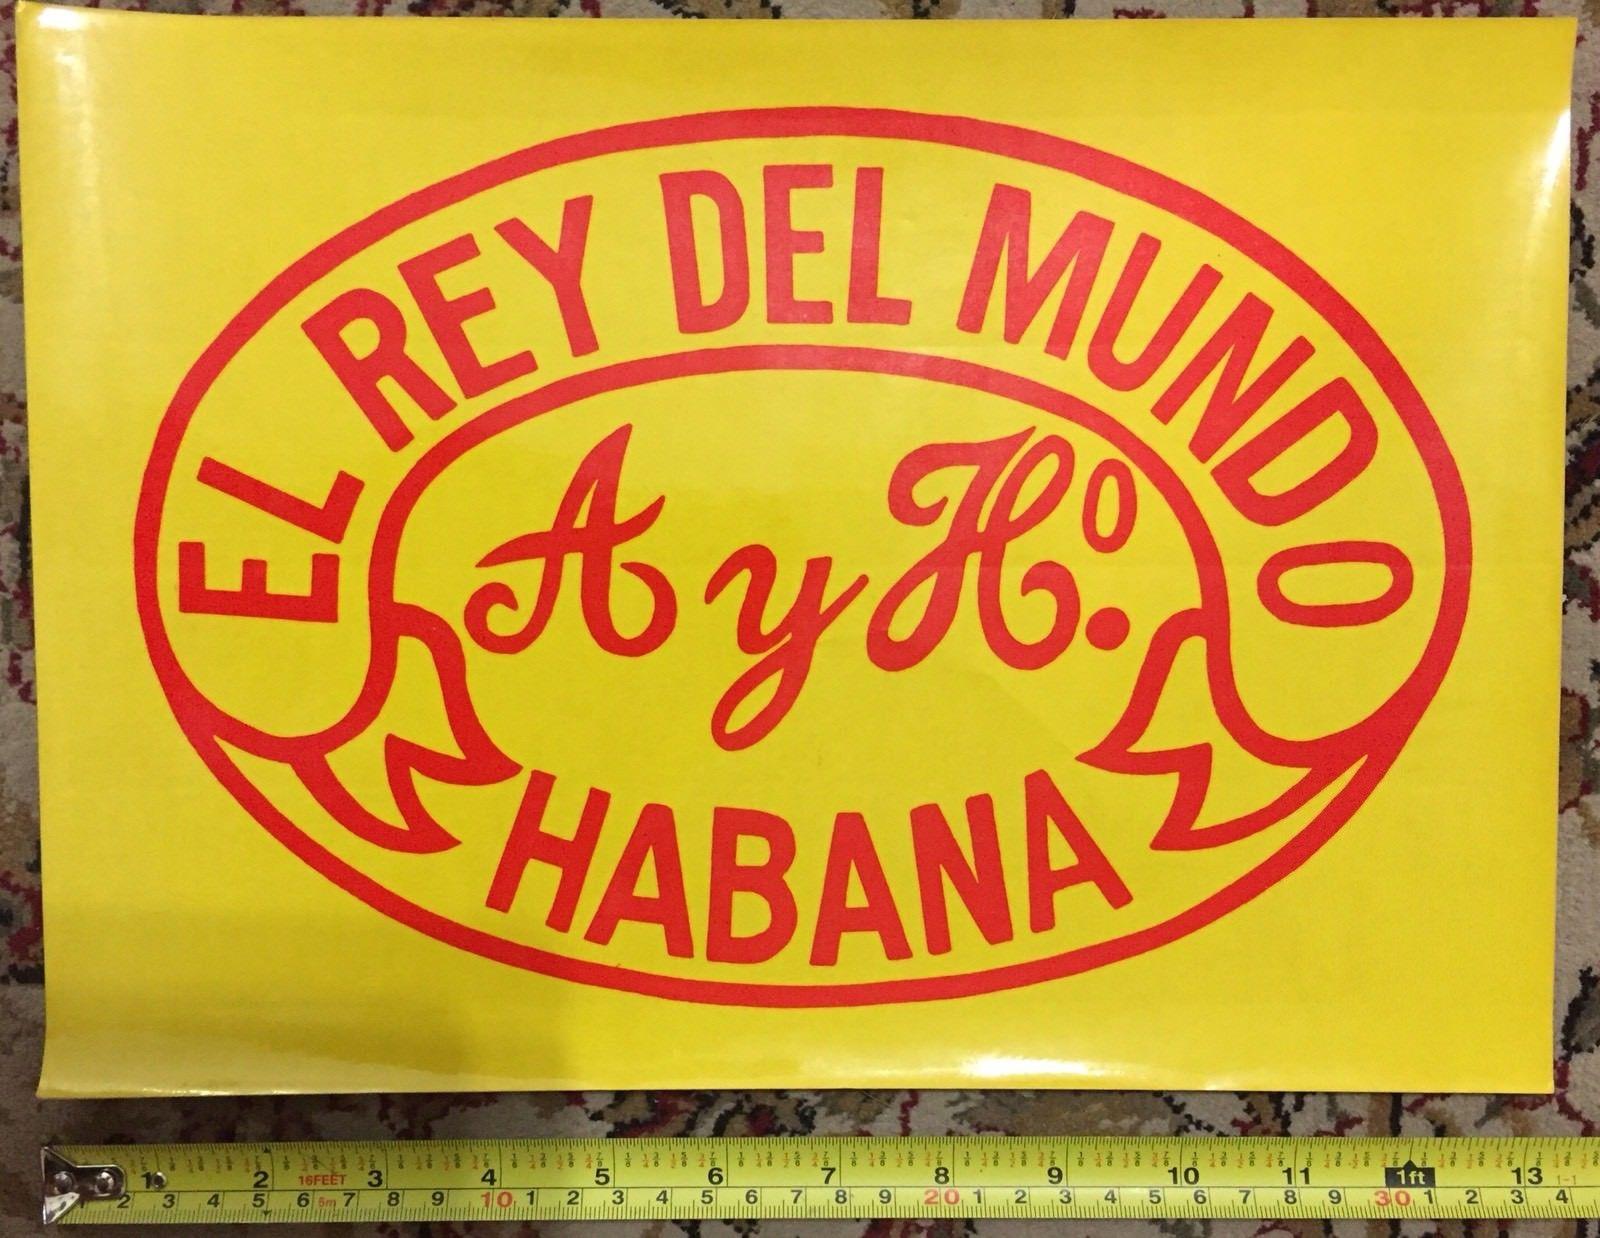 vintage-flyers-of-old-havana-cigar-factories-vintage-_57vv.jpg